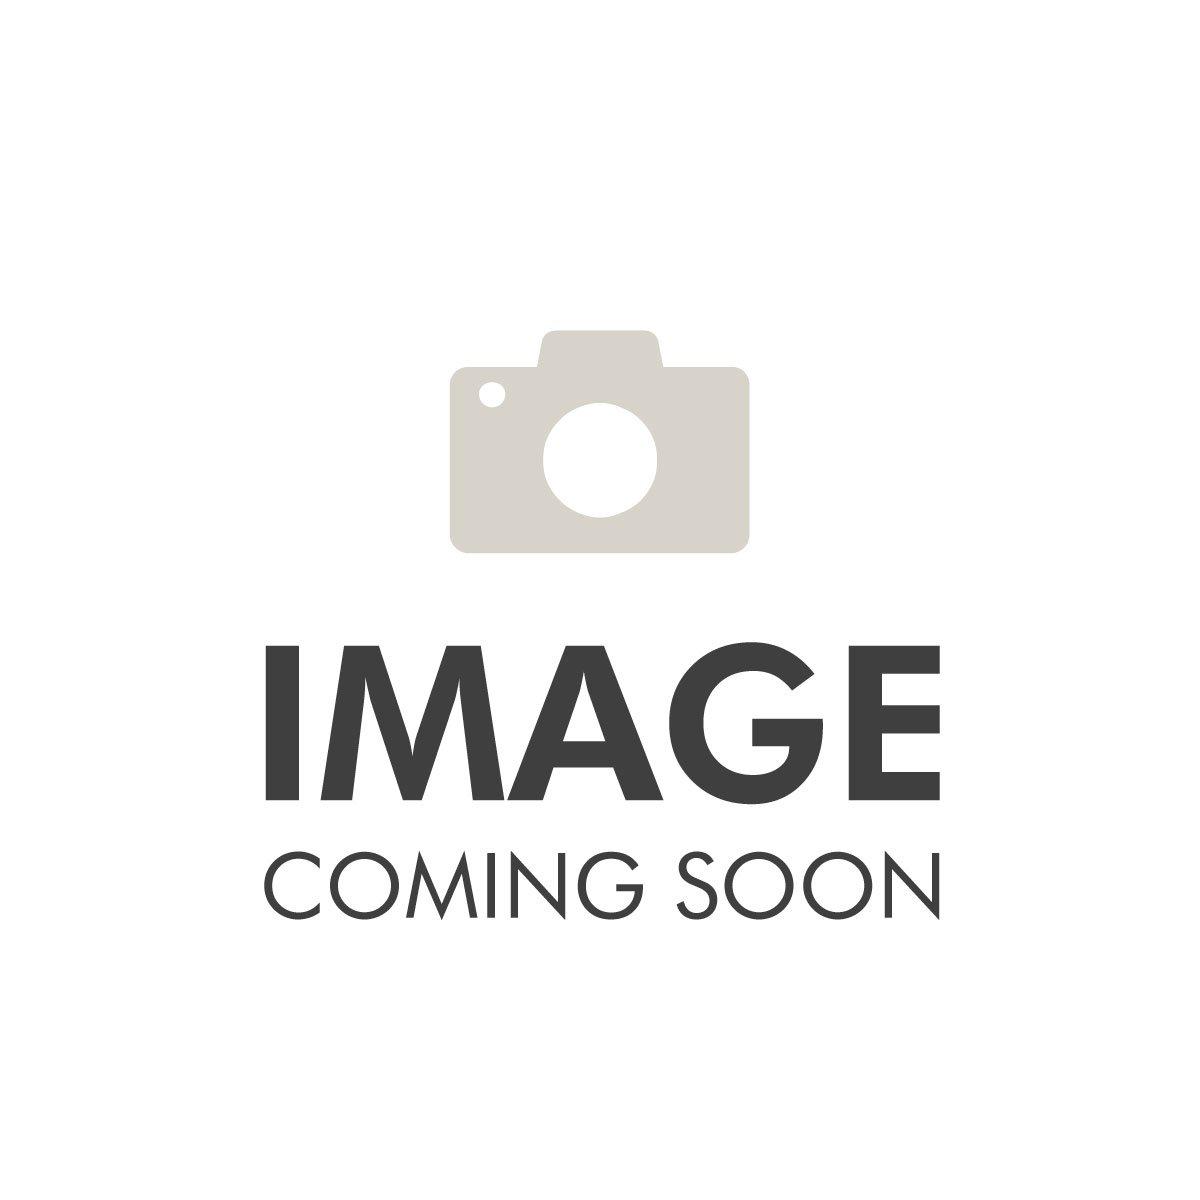 Lancome Miracle 100ml EDP Spray